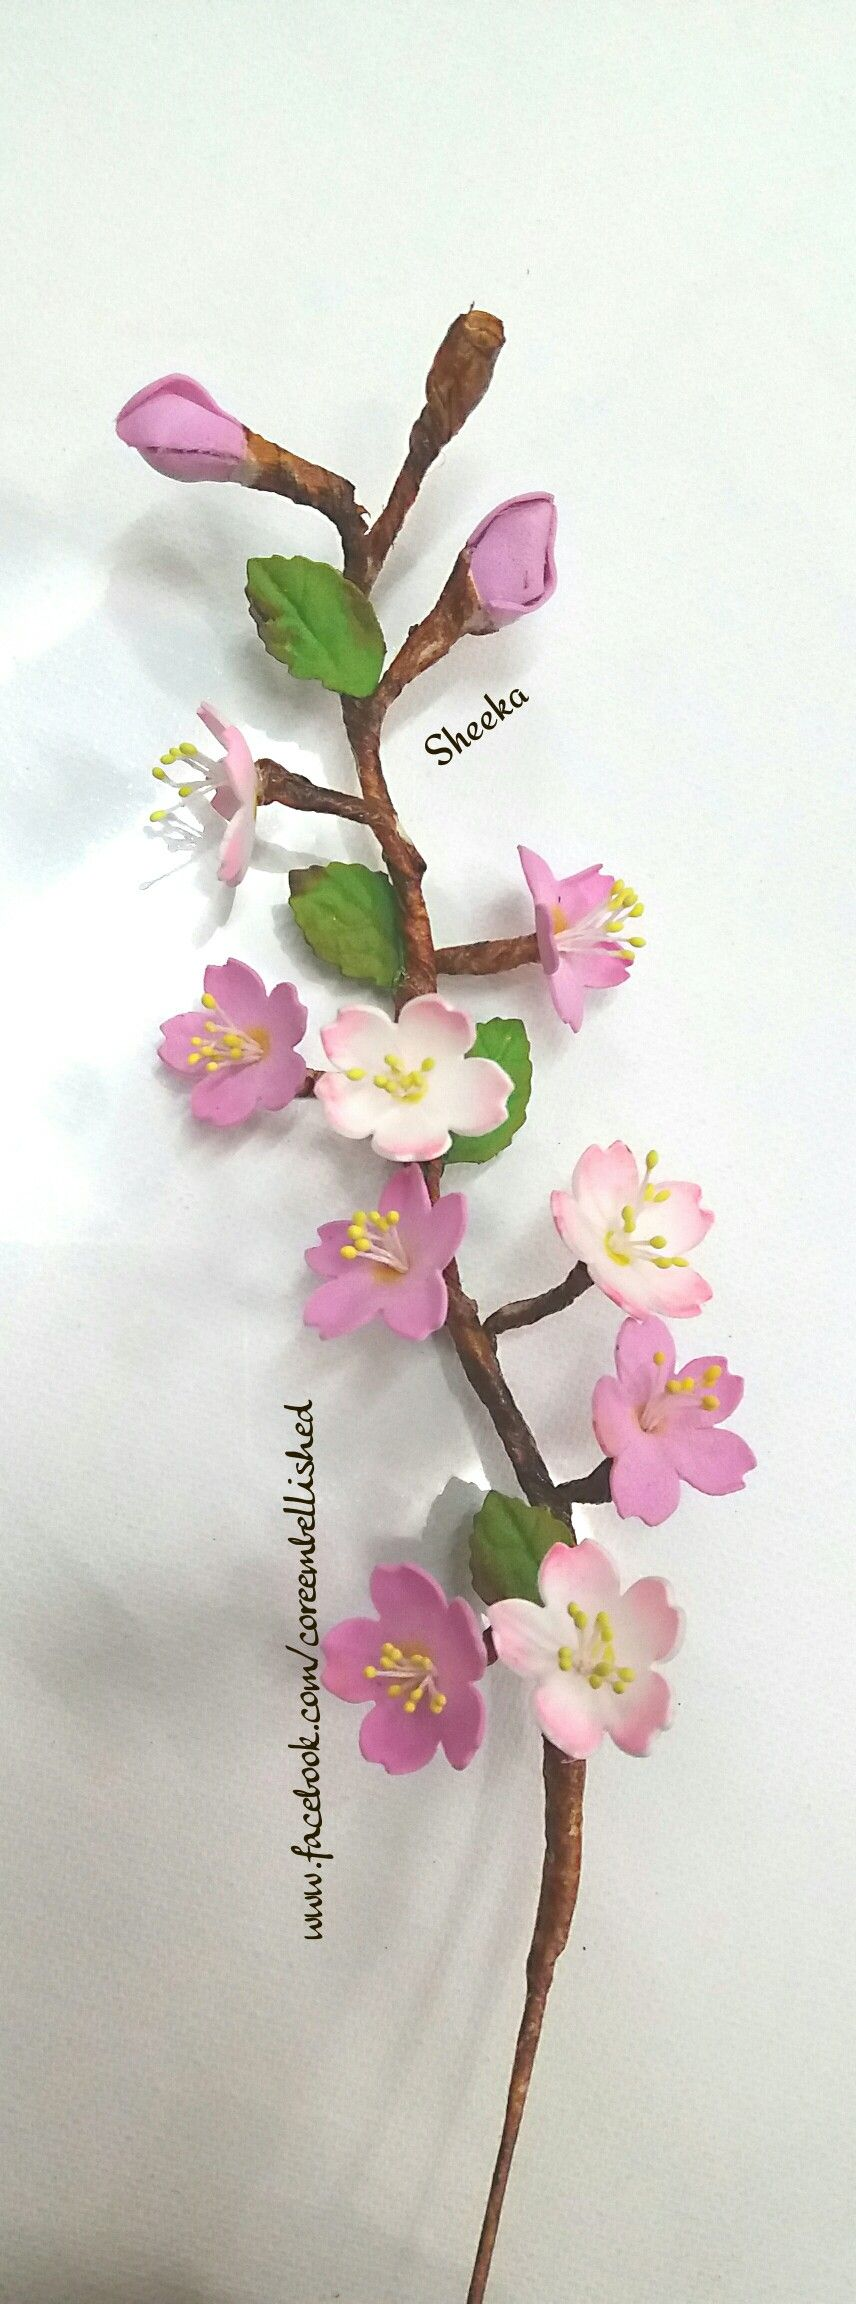 Cherry Blossom Foamiran India Cherry Blossom Blossom Handmade Crafts